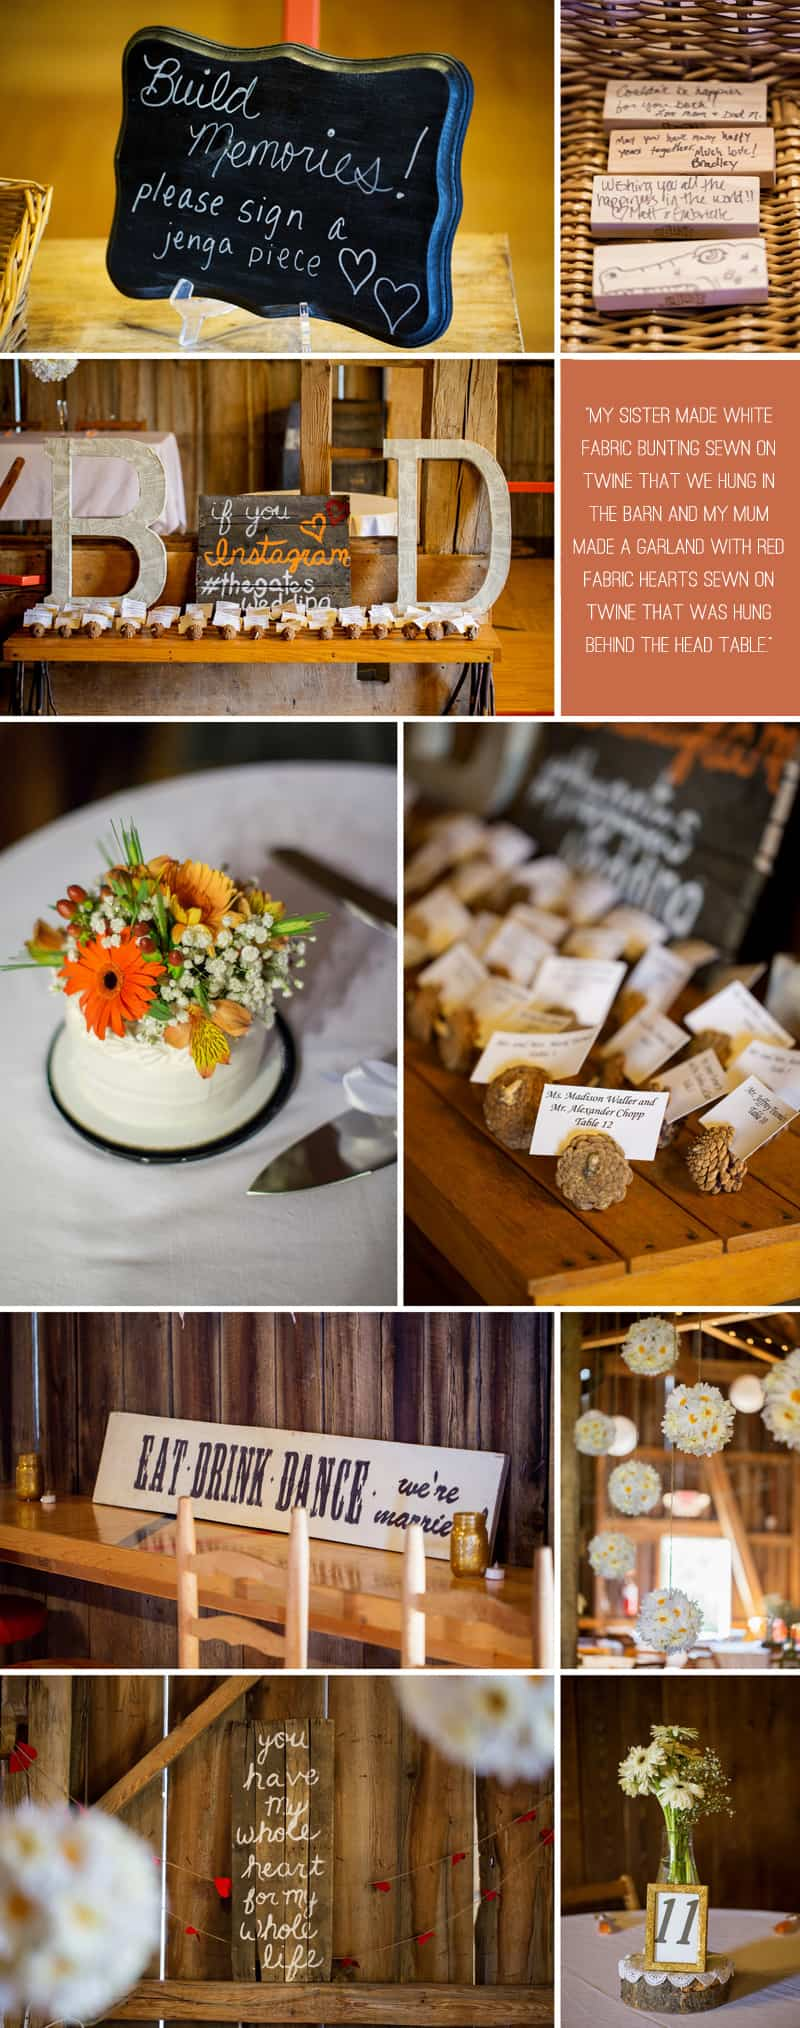 A Romantic Fall Wedding in a Rustic Barn 6